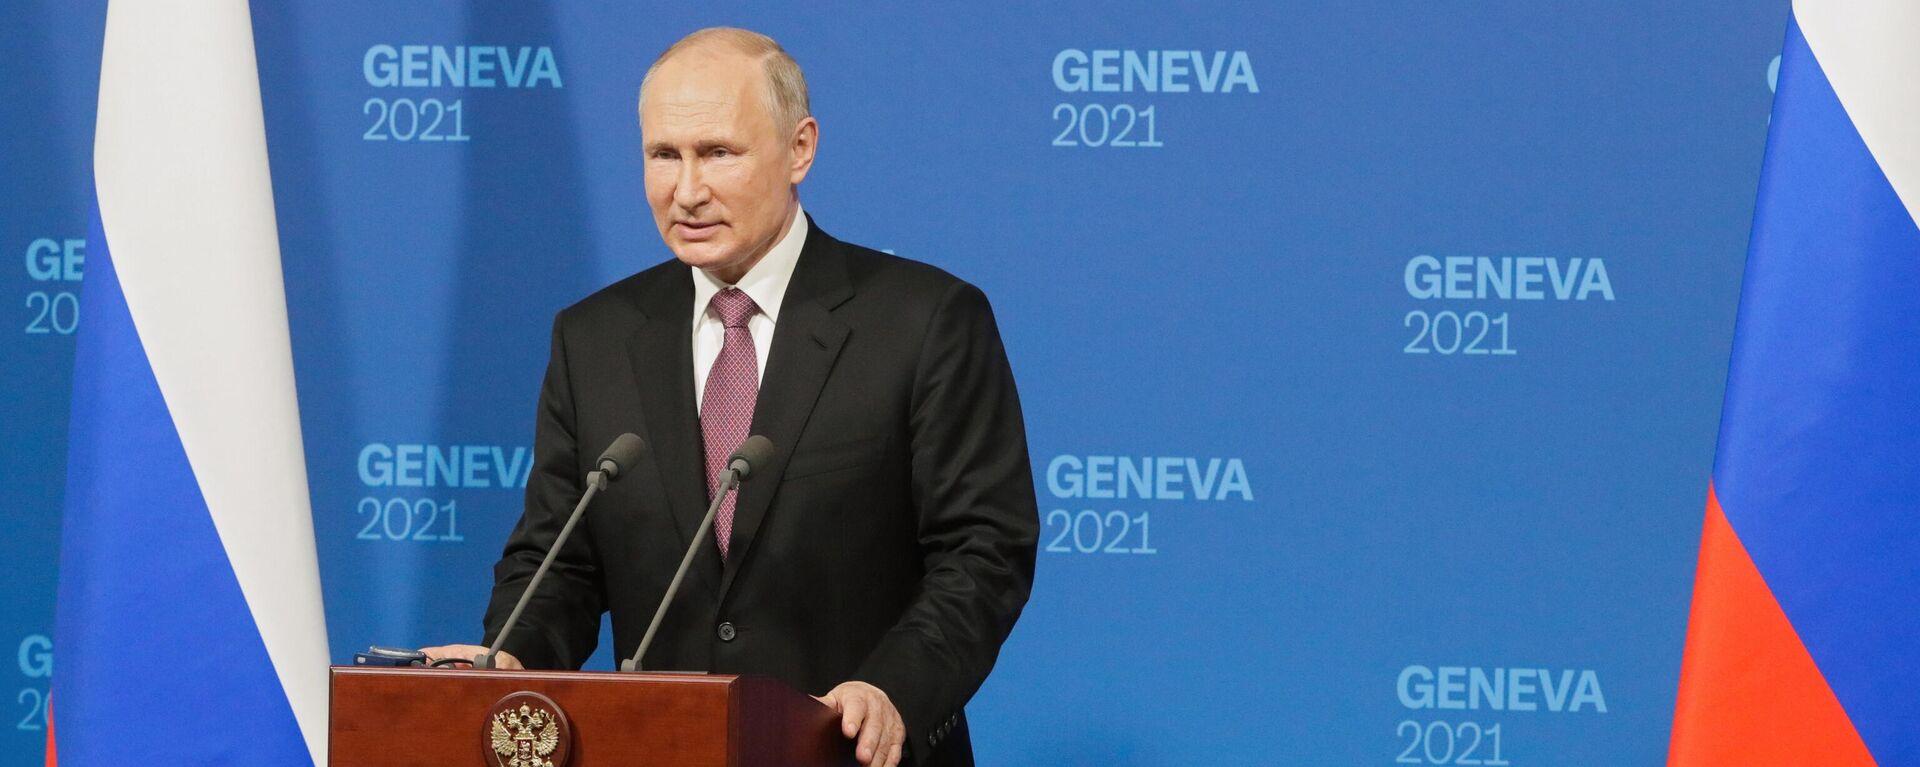 Vstrecha prezidentov Rossii i SSHA V. Putina i Dj. Baydena v Jeneve - Sputnik Oʻzbekiston, 1920, 16.06.2021